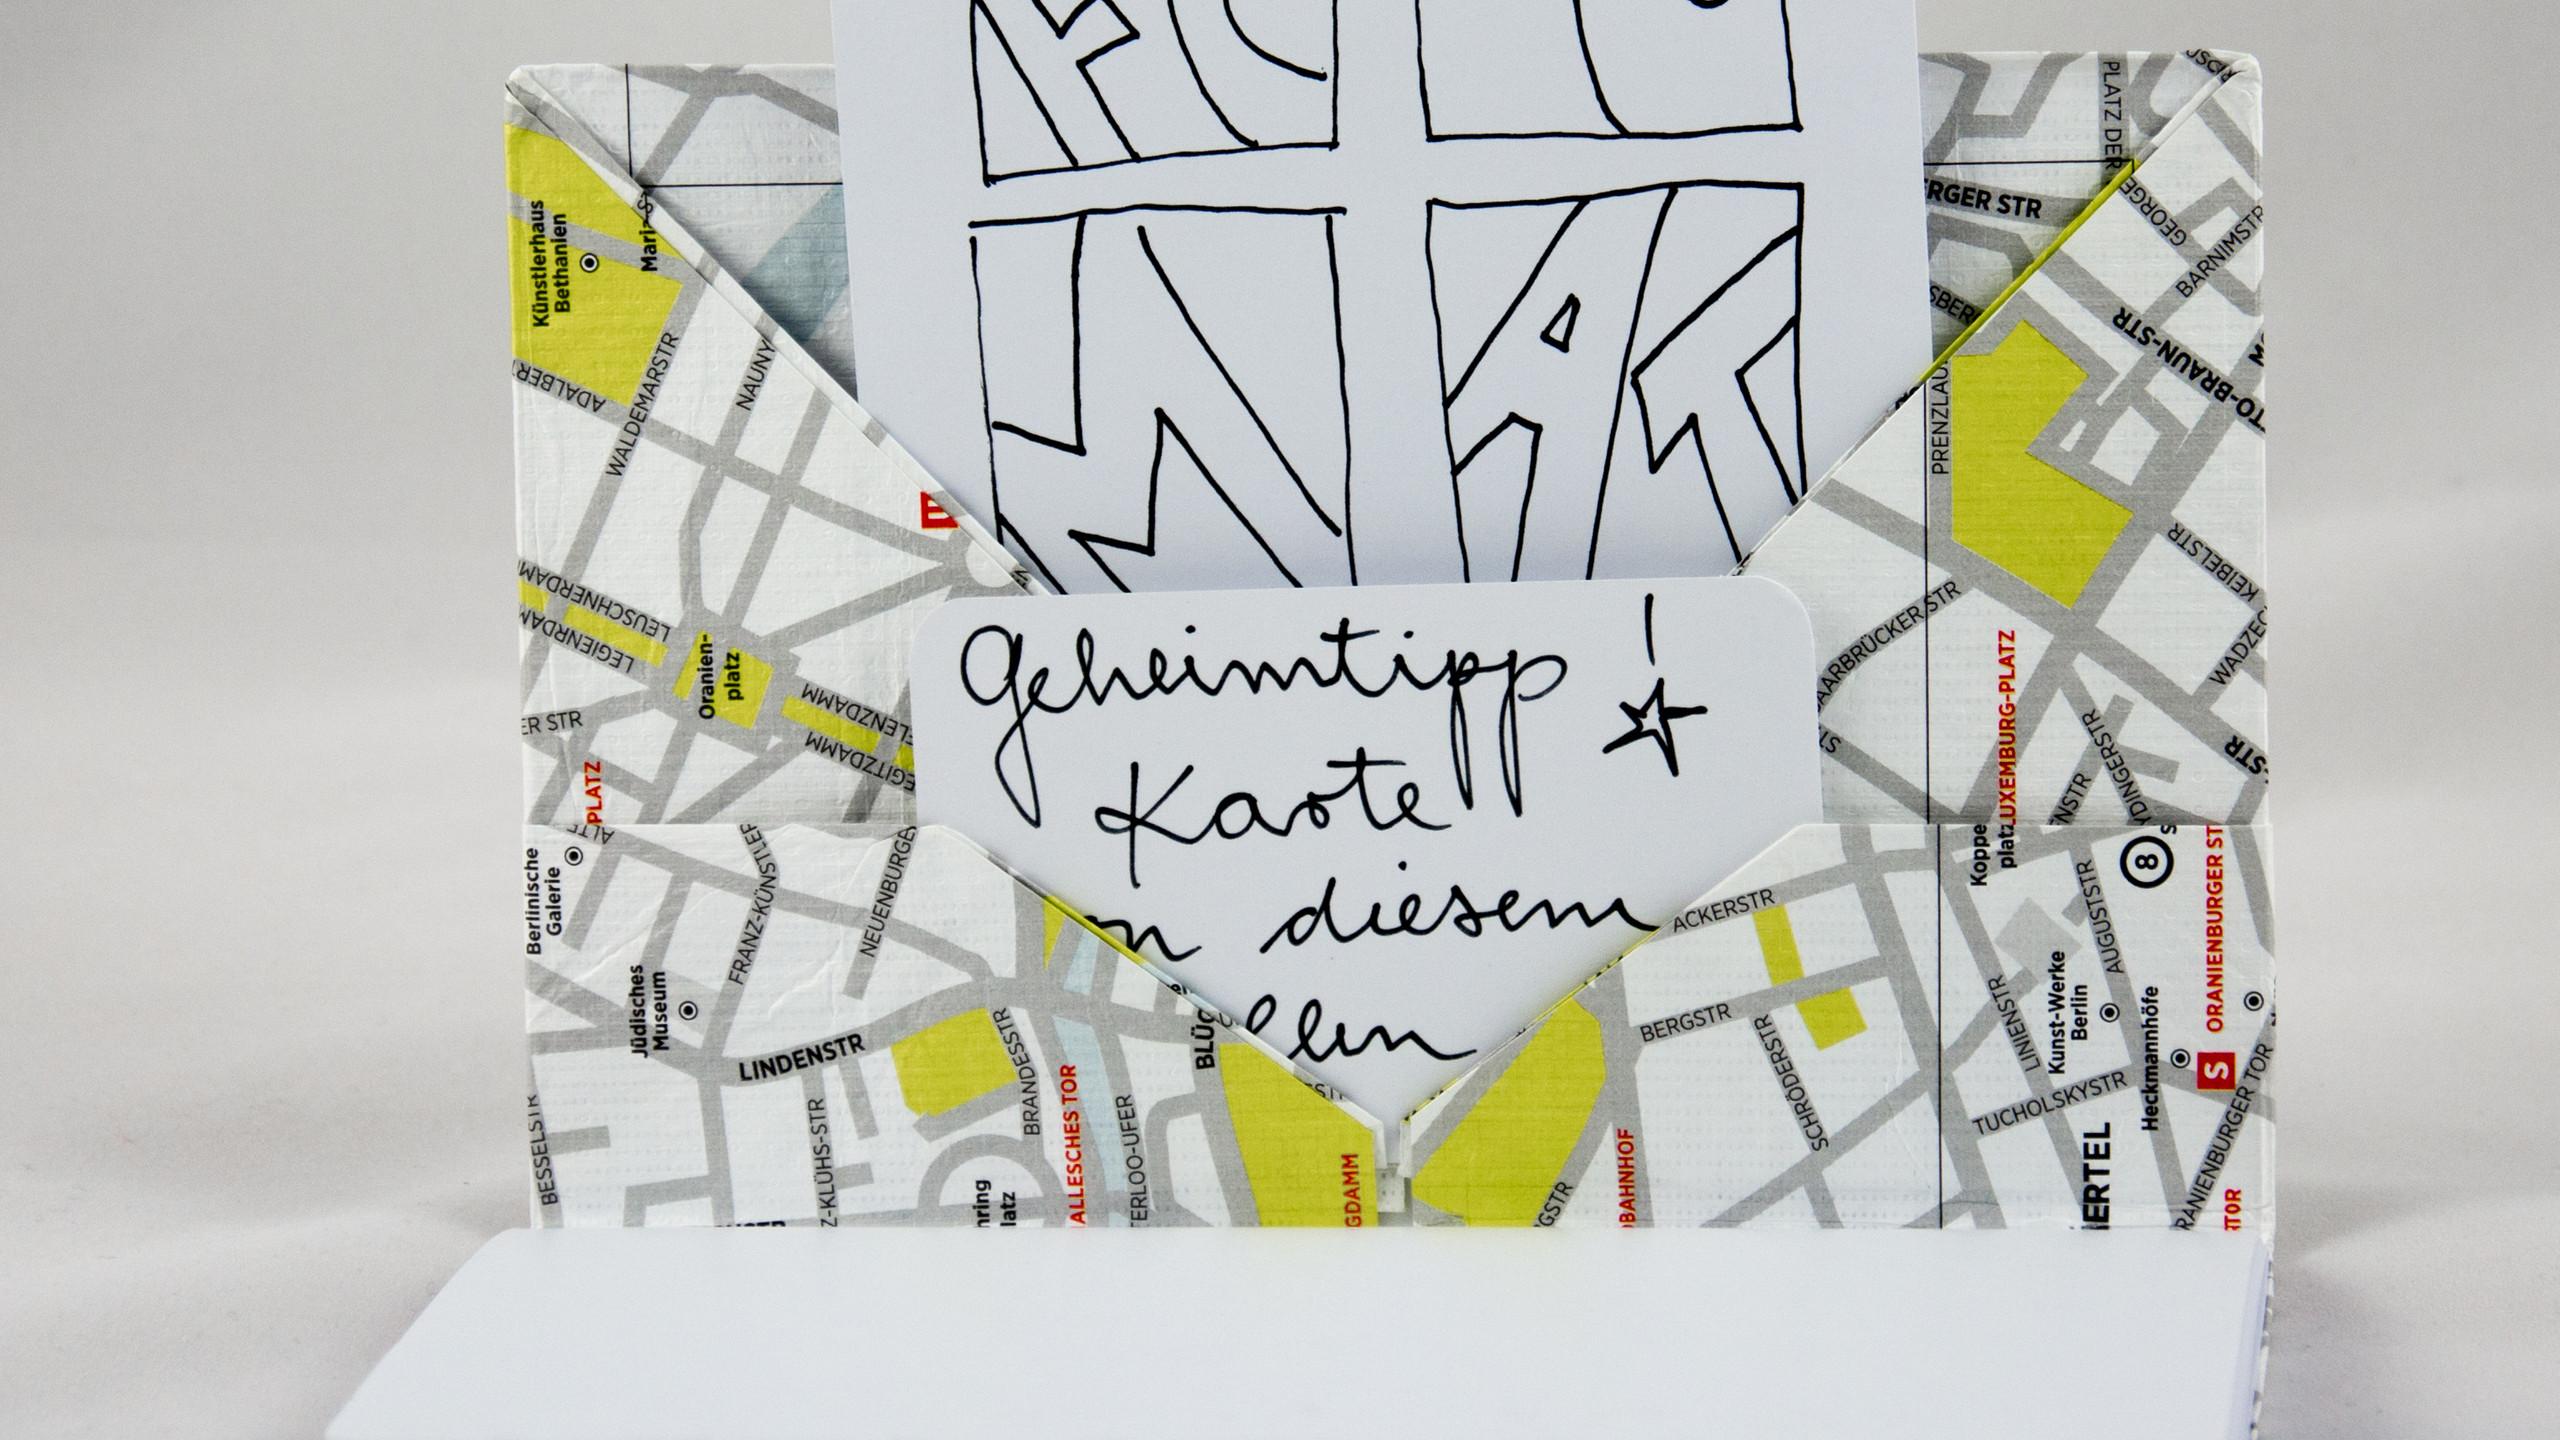 Carnet_de_vovage_Berlin_Beispiel